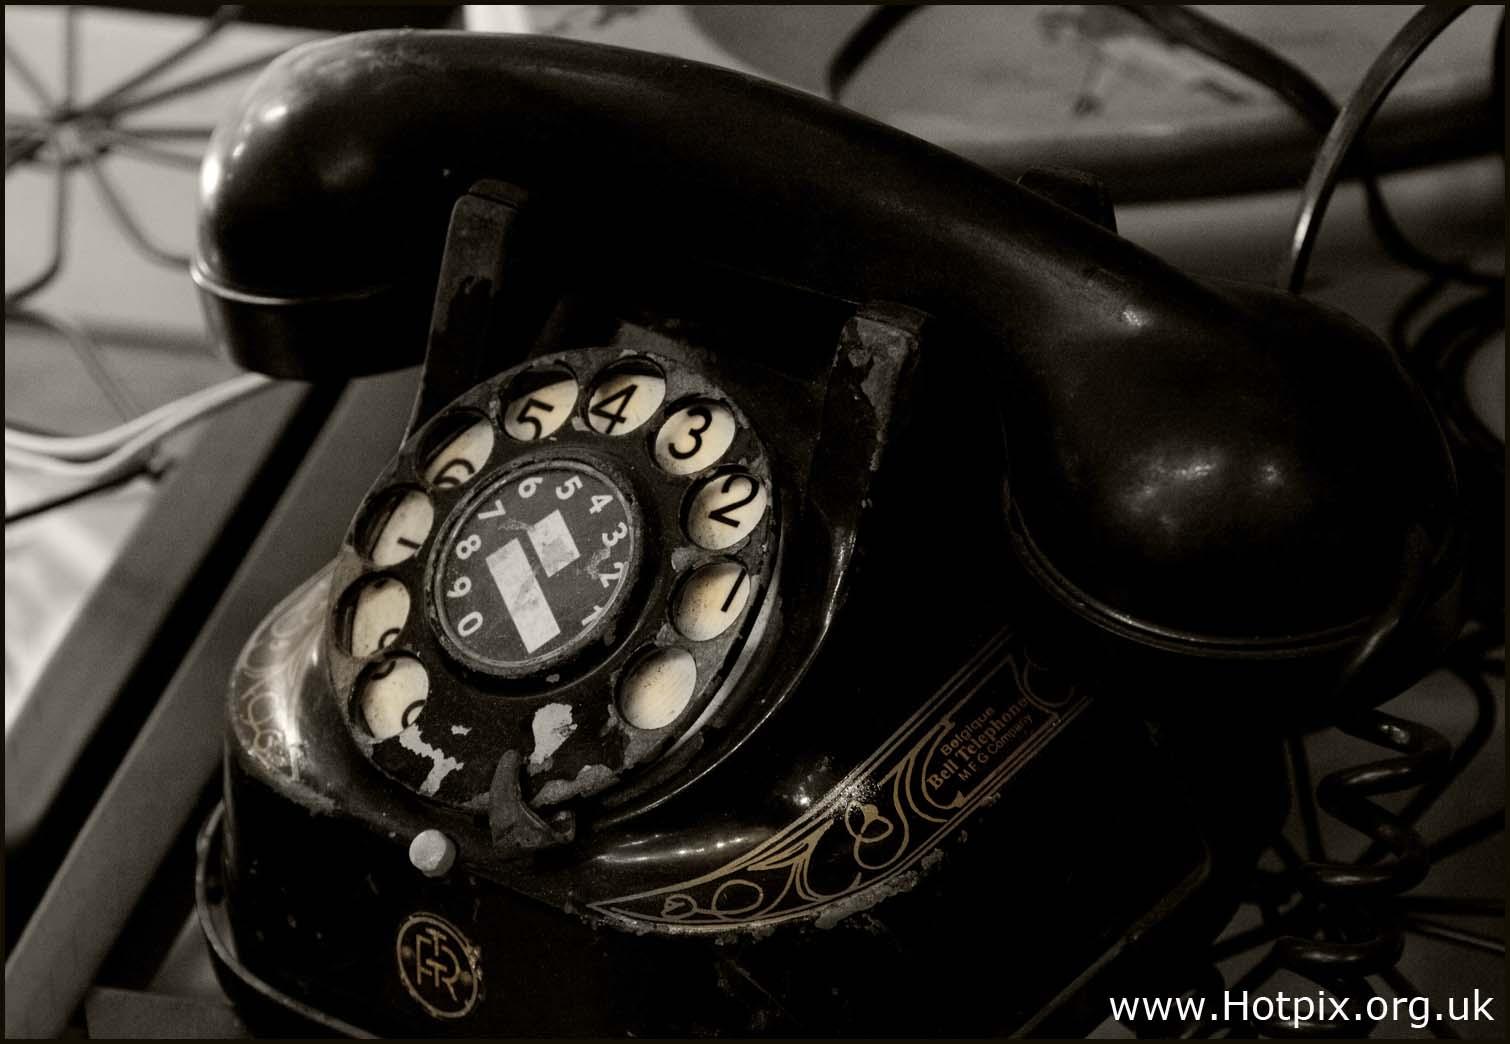 Bell,Telephone,Manufacturing,Company,co,phone,black,white,old,1920,1930,dial,rotary,Antwerp,belgian,Belgium,Alcatel,Lucent,selective,colour,color,toned,sepia,mono,monochrome,stuff,selectivo,couleur,s\u00e9lective,vorgew\u00e4hlte,Farbe,hotpix!